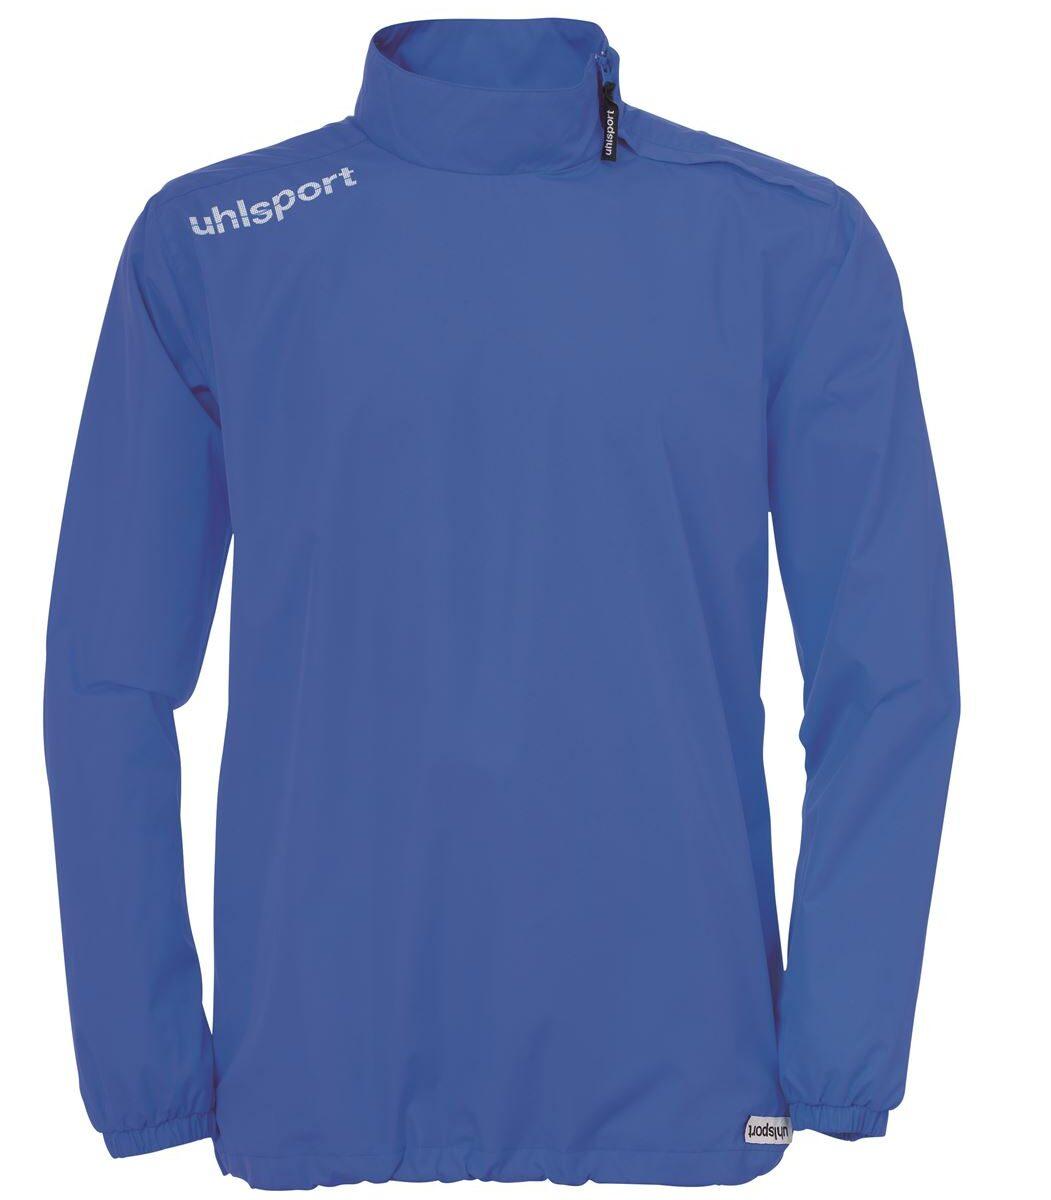 Uhlsport Essential Windbreaker 100 3251